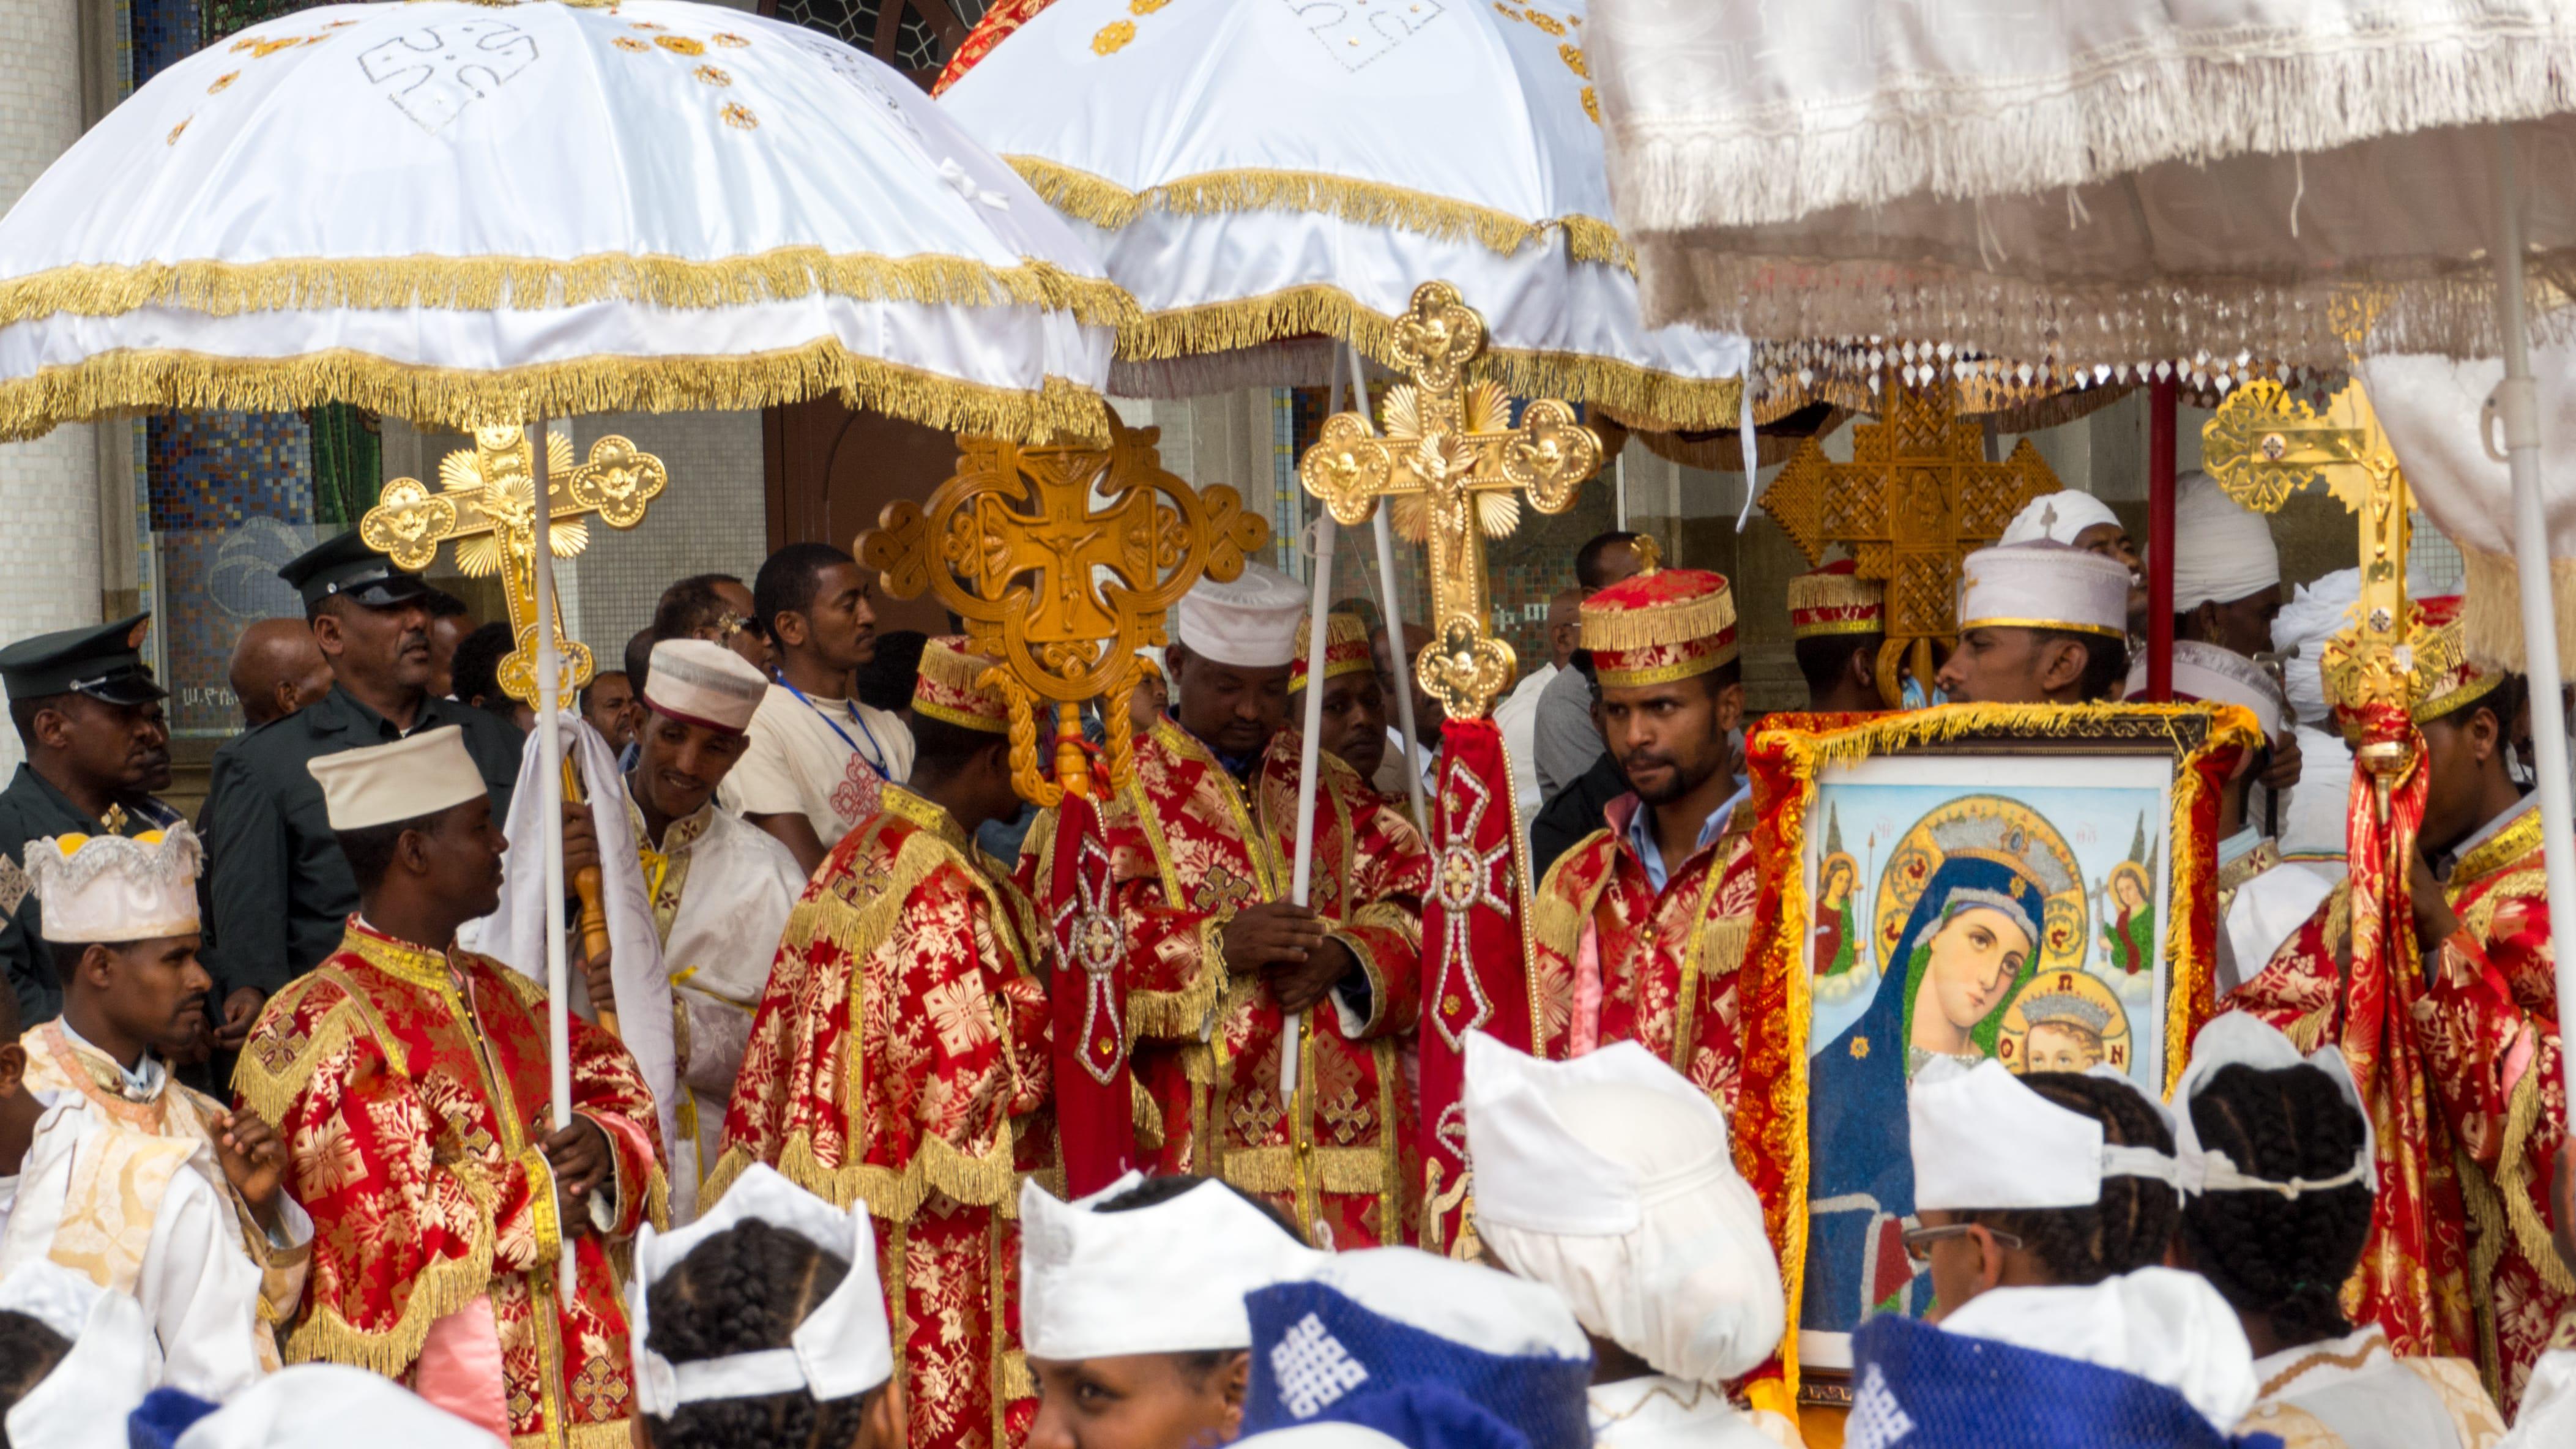 A Cultural Tour Through Ethiopia 2018 - Chalo Africa